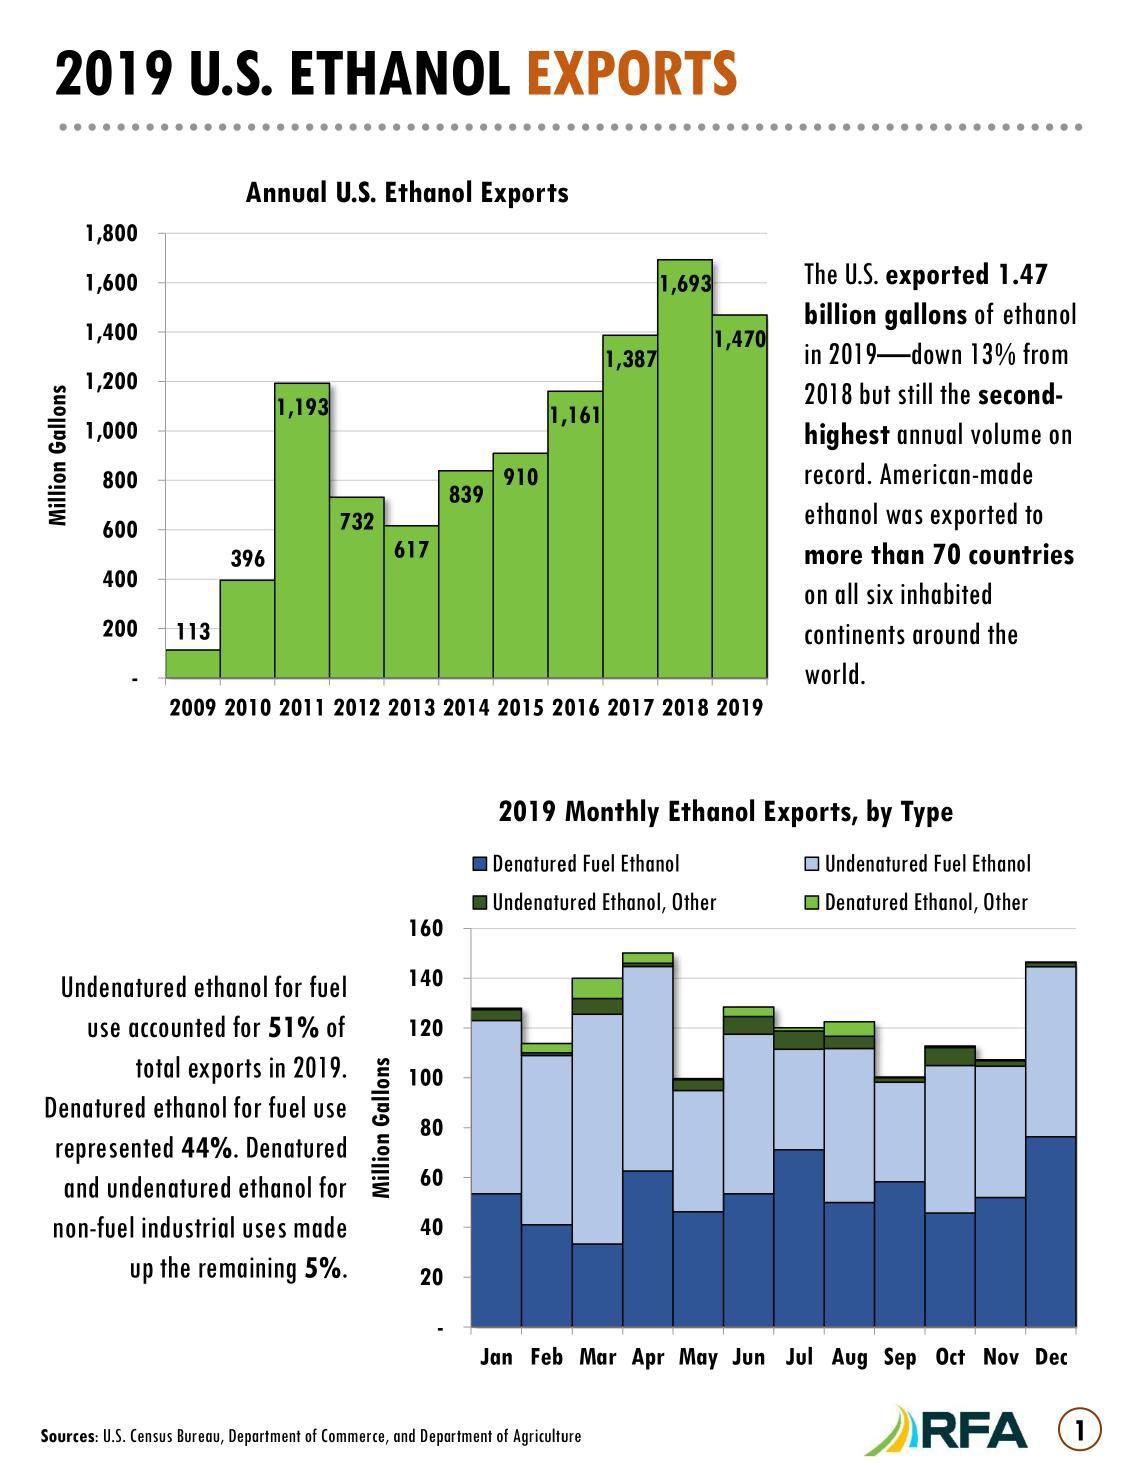 2019 U.S. Ethanol Exports